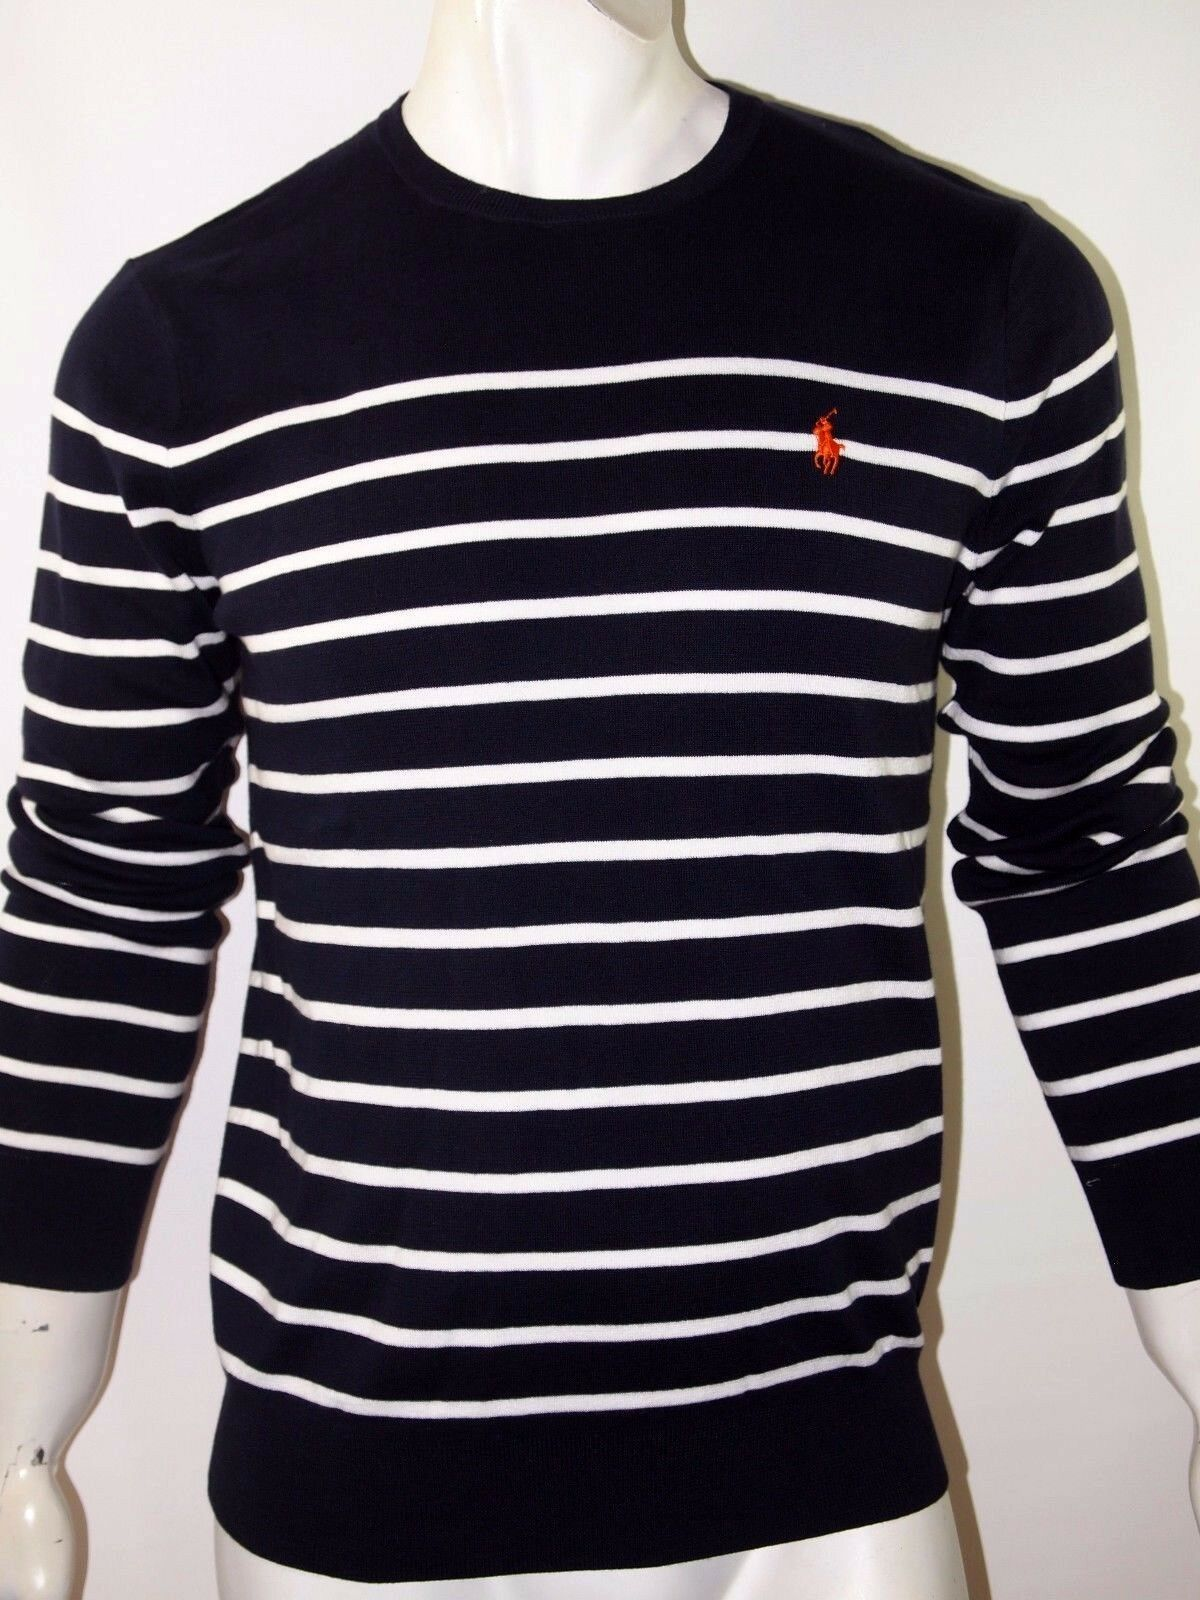 Polo Ralph Lauren striped pima light weight sweater Größe xl color navy Blau